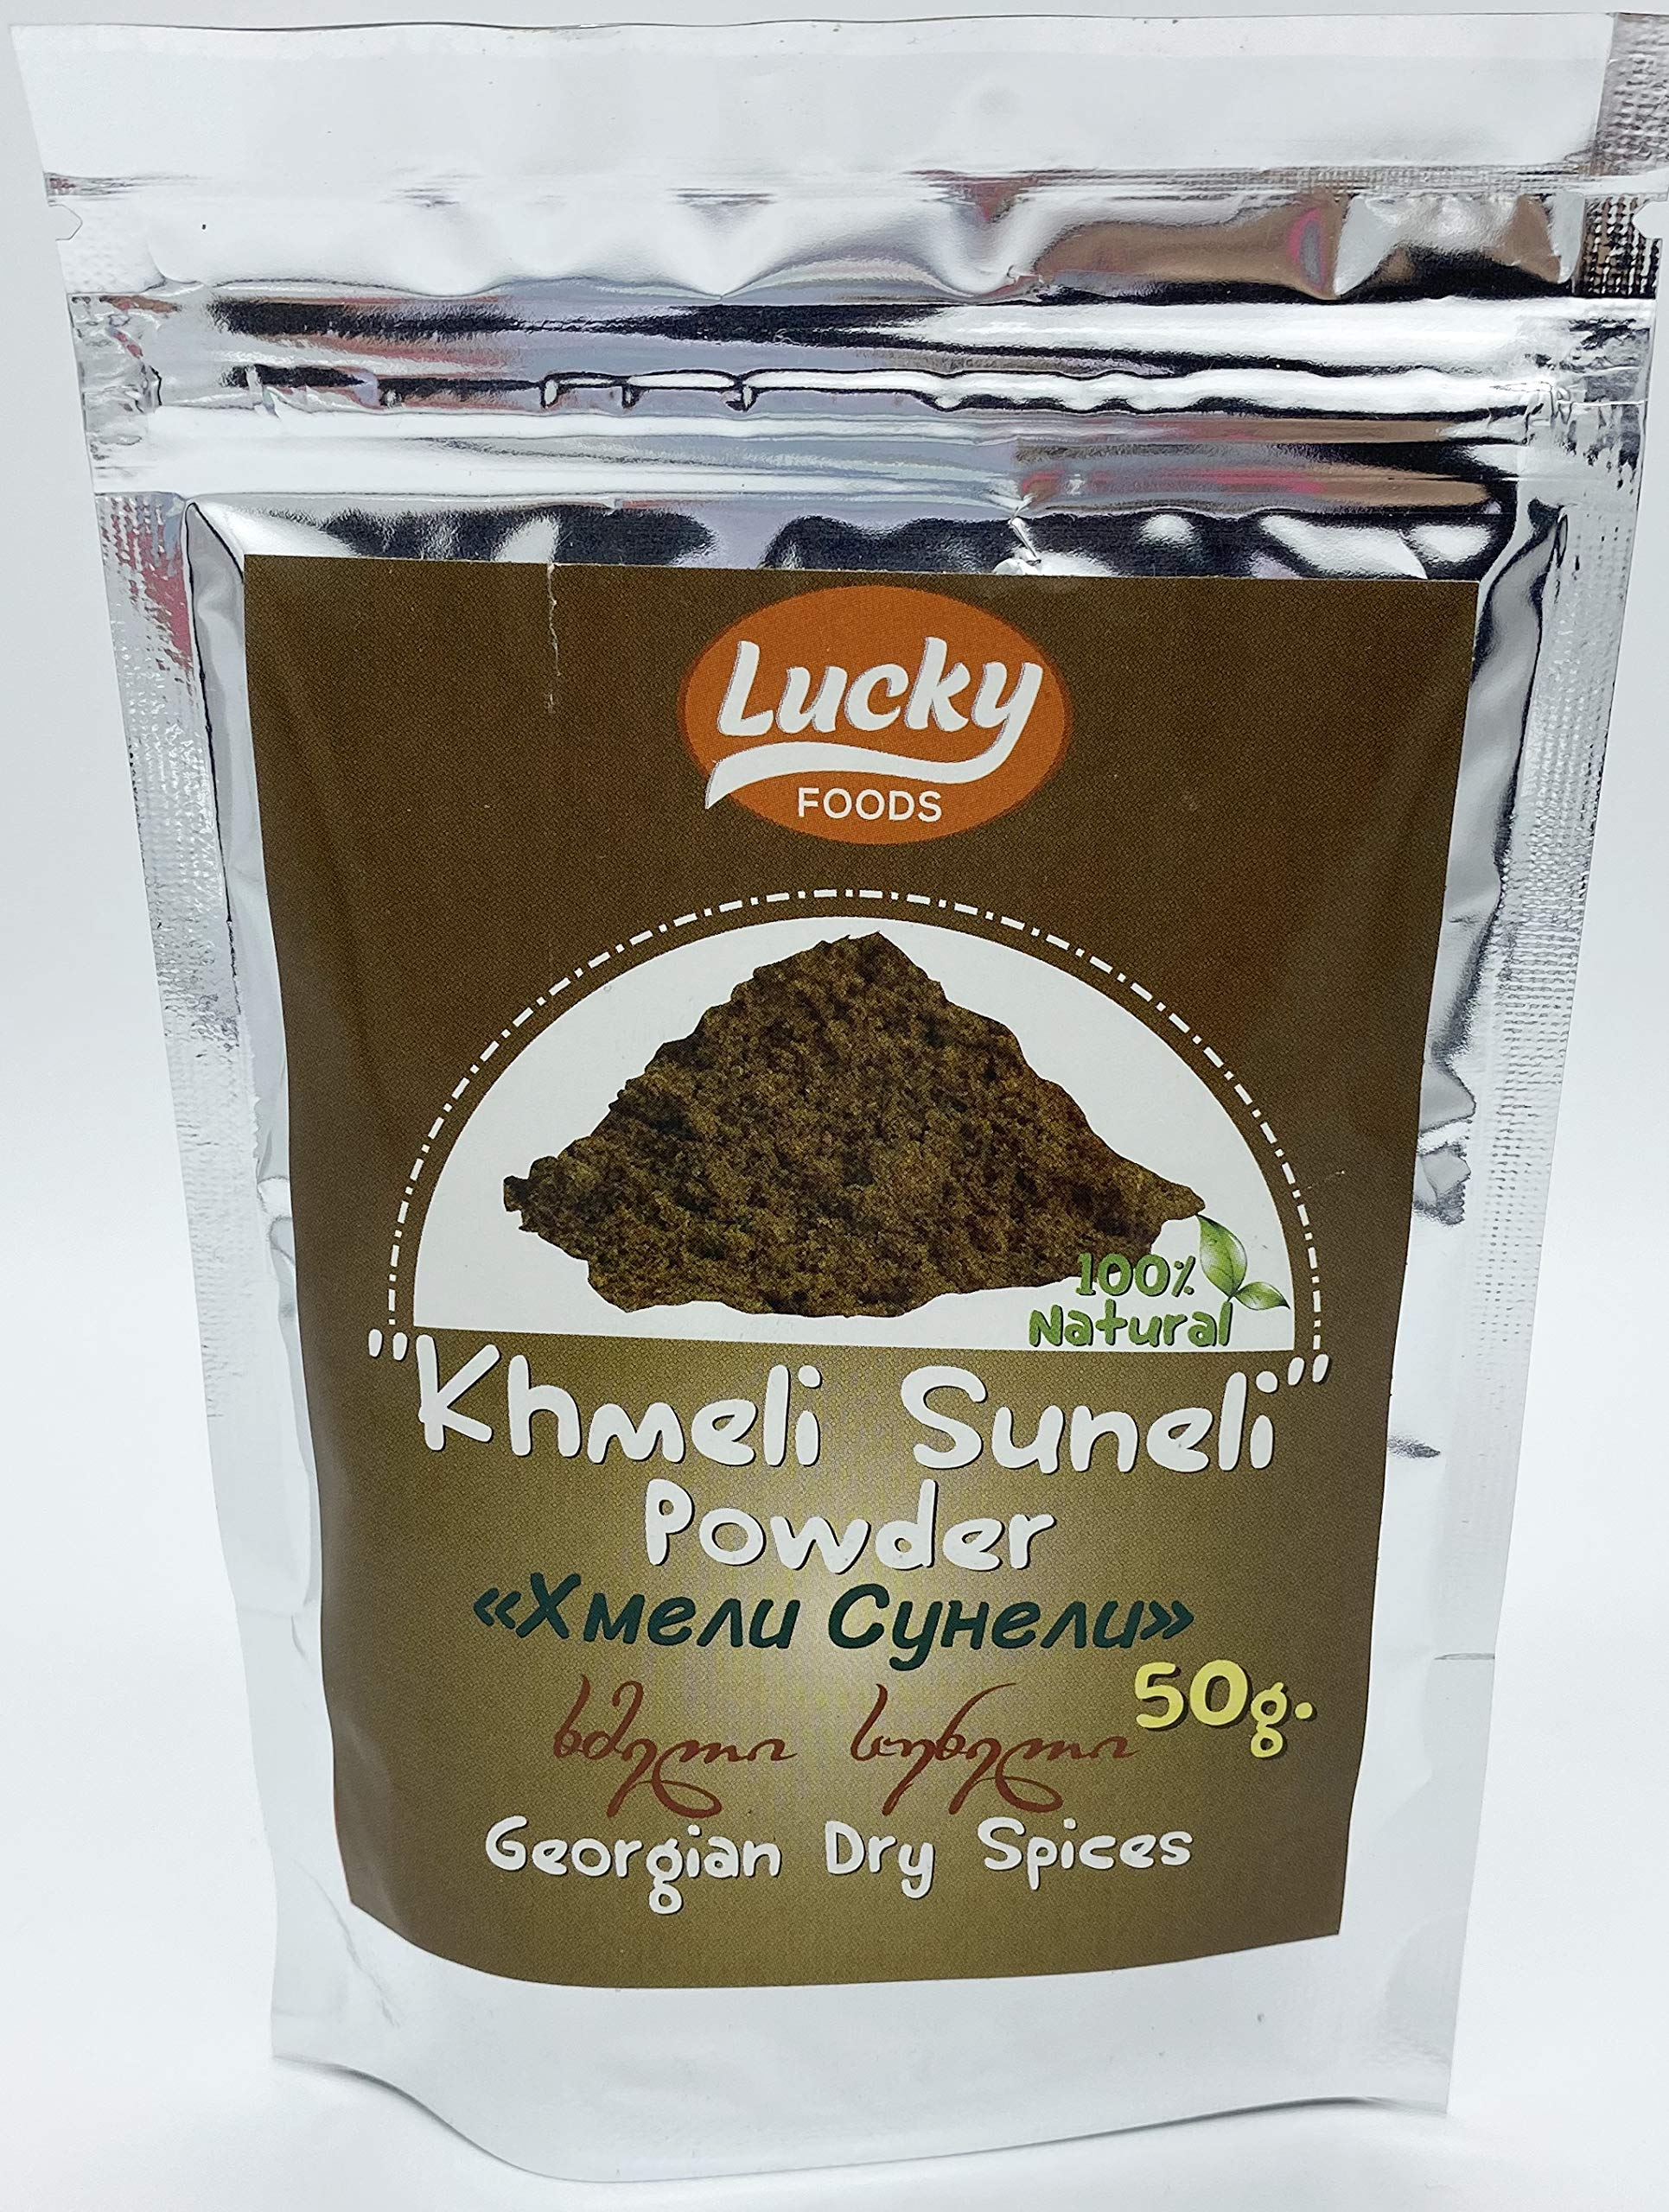 Khmeli Suneli 1.8 Ounce / 50 Gr, 100% Natural Dry Spice, Imported from Georgia